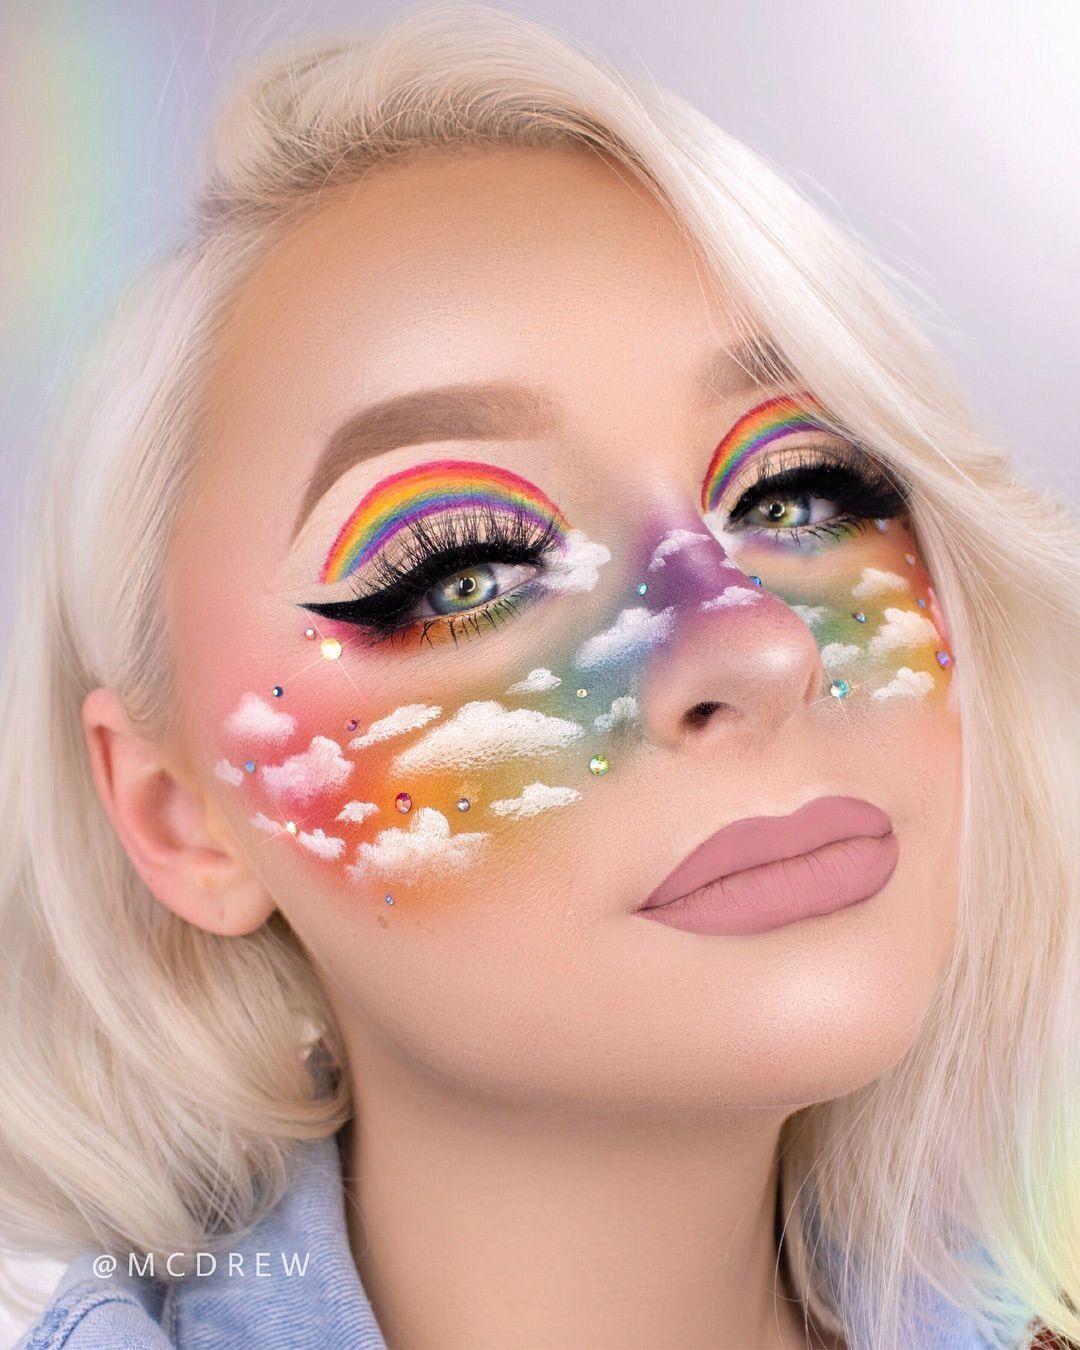 Follow xkashax Christmas Makeup Water in 2020